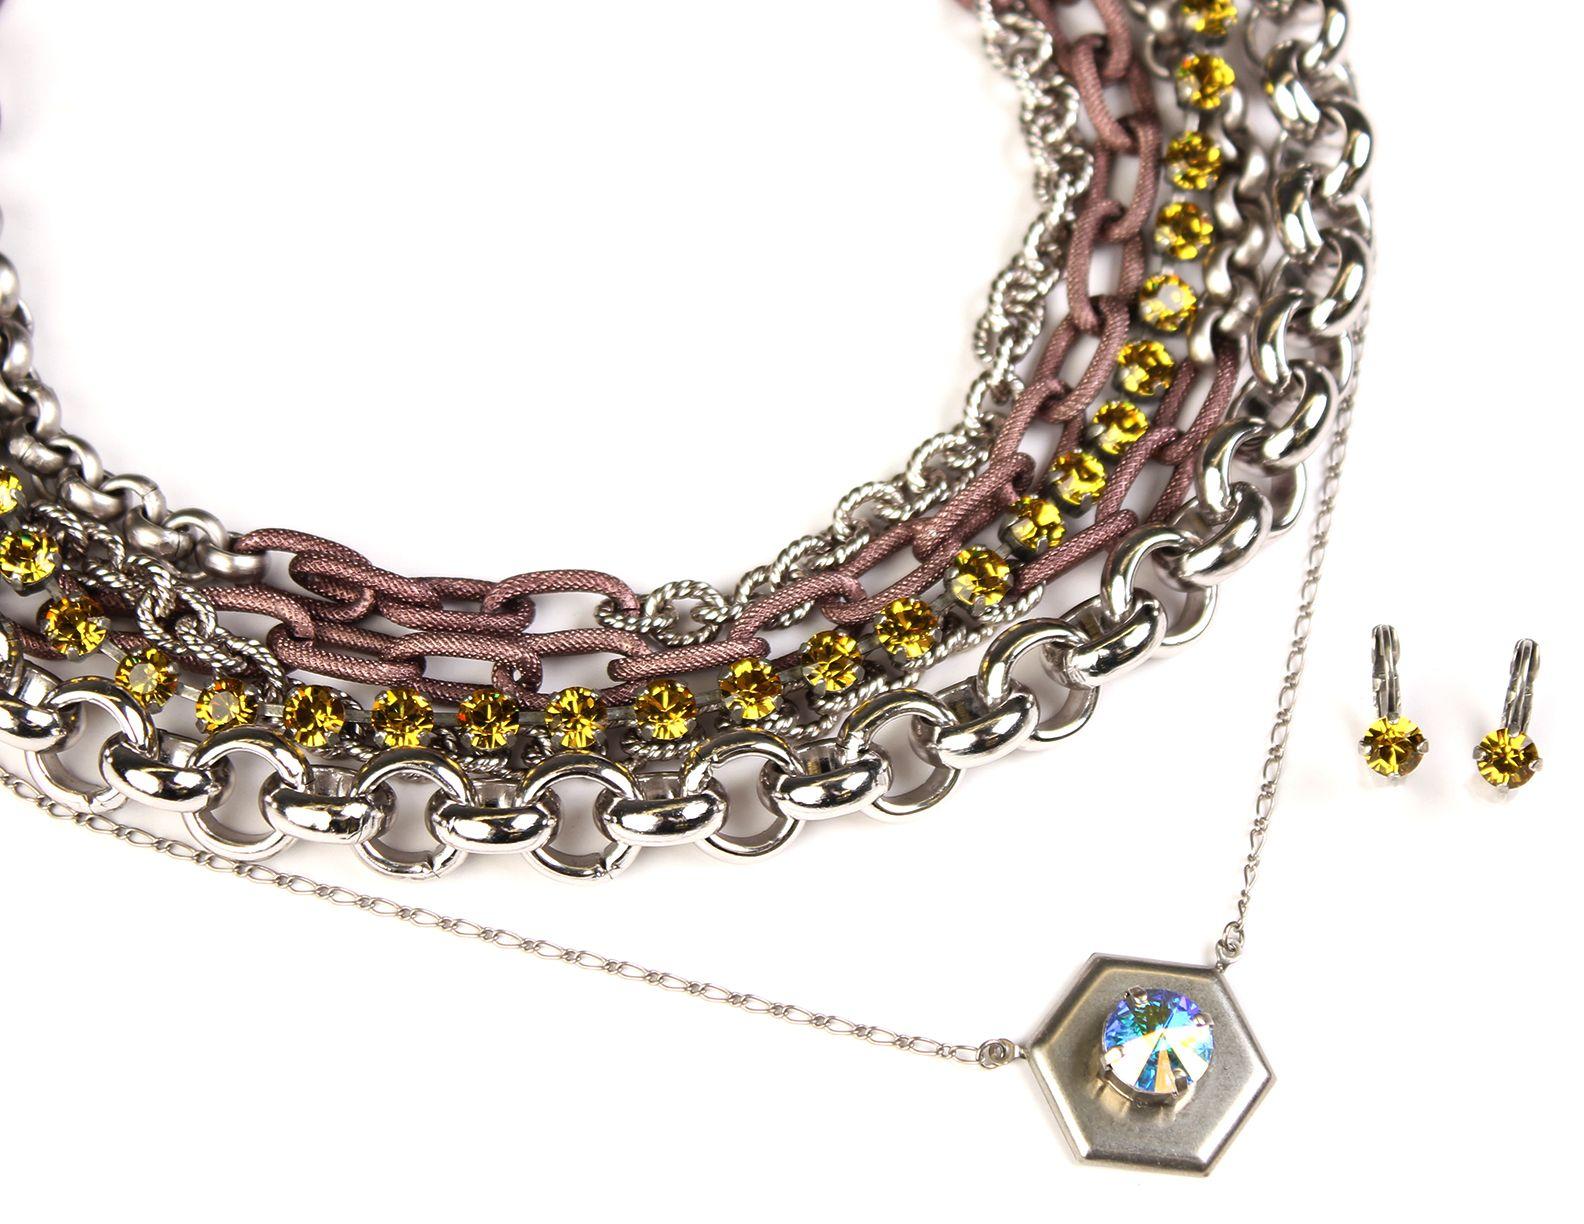 Sabika look necklace - Layered Chain And Choker Look Featuring Bold Colors Sabika London Choker Sahara Dusk 3